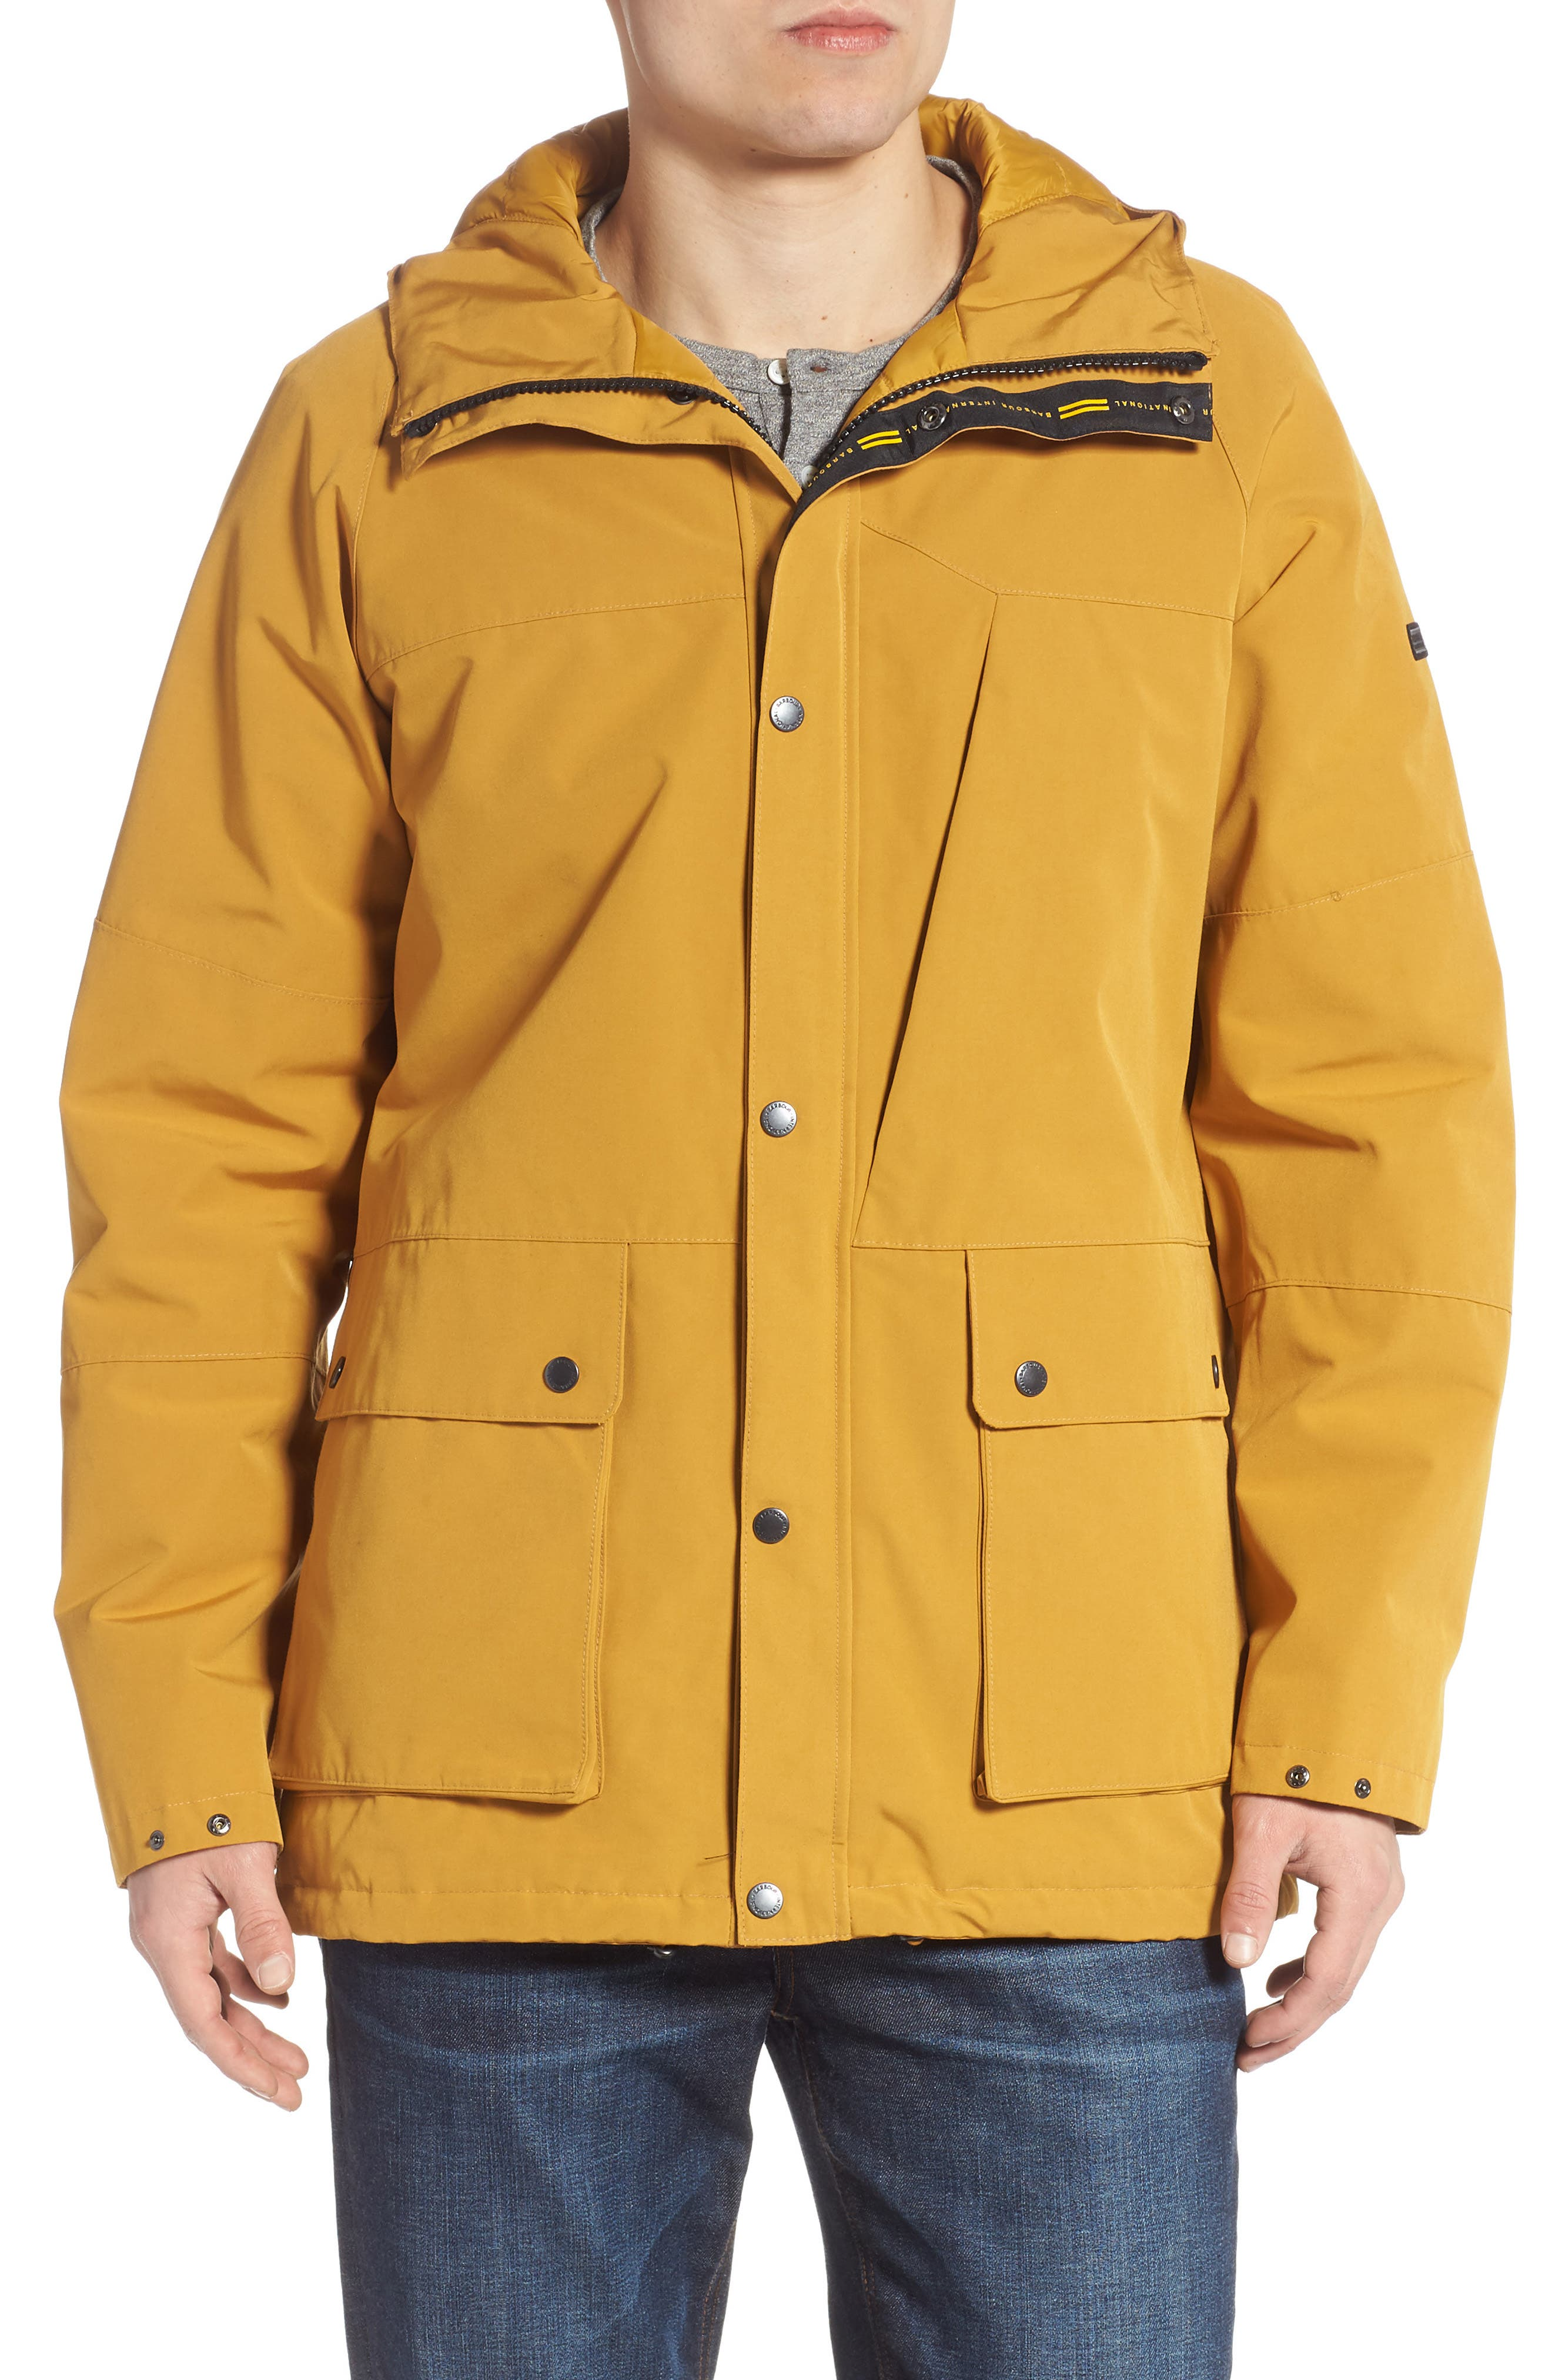 BARBOUR, Bi-Ridge Waterproof Hooded Jacket, Main thumbnail 1, color, YELLOW